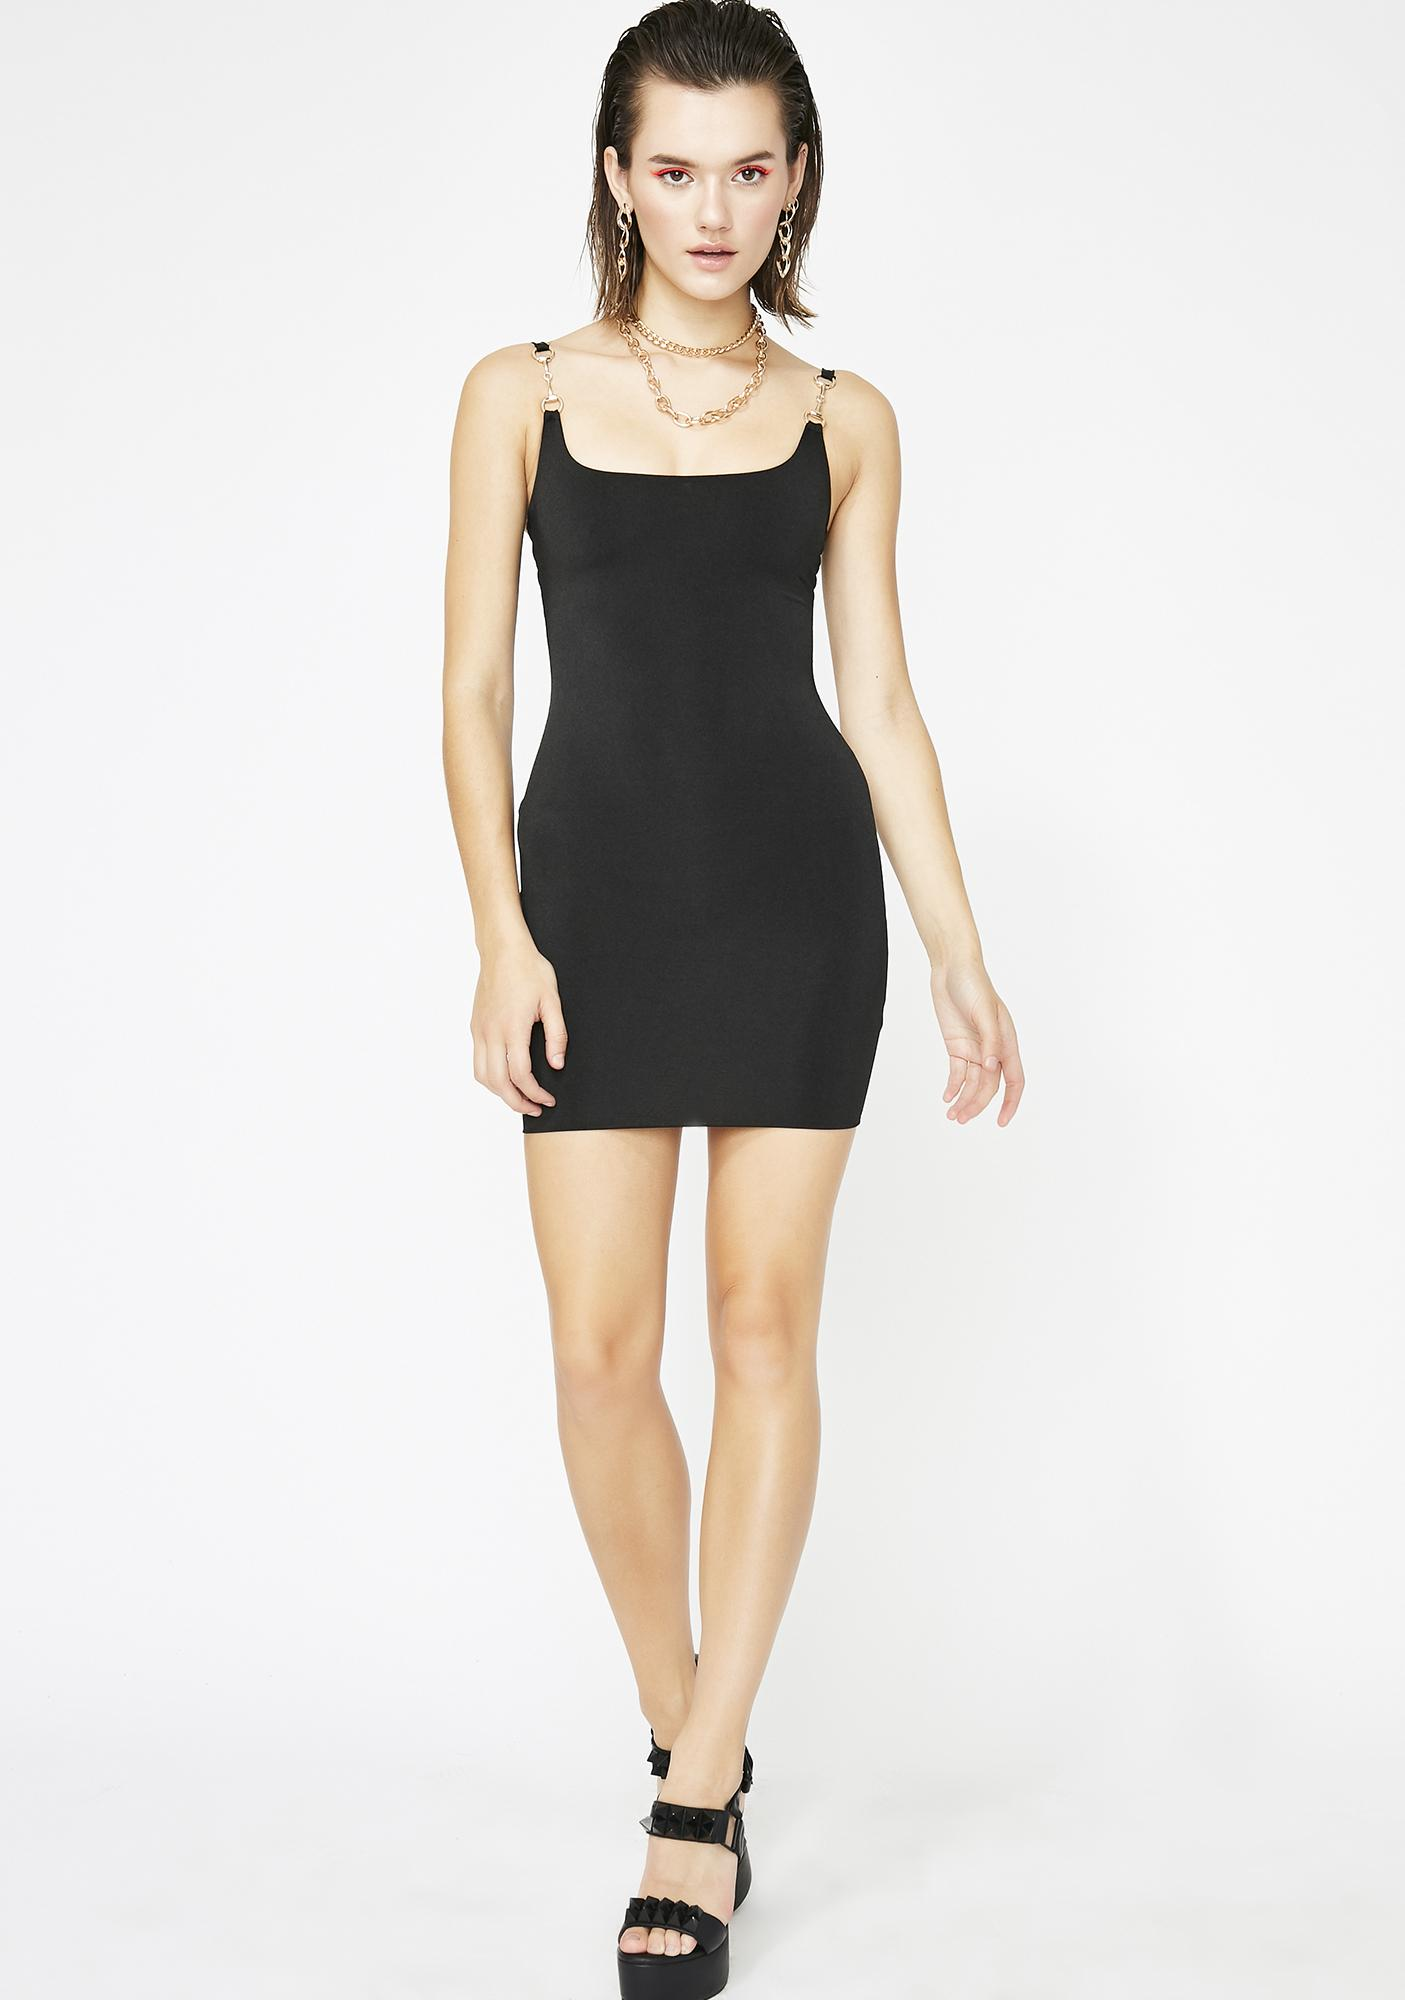 Sinful Made Ya Lurk Mini Dress